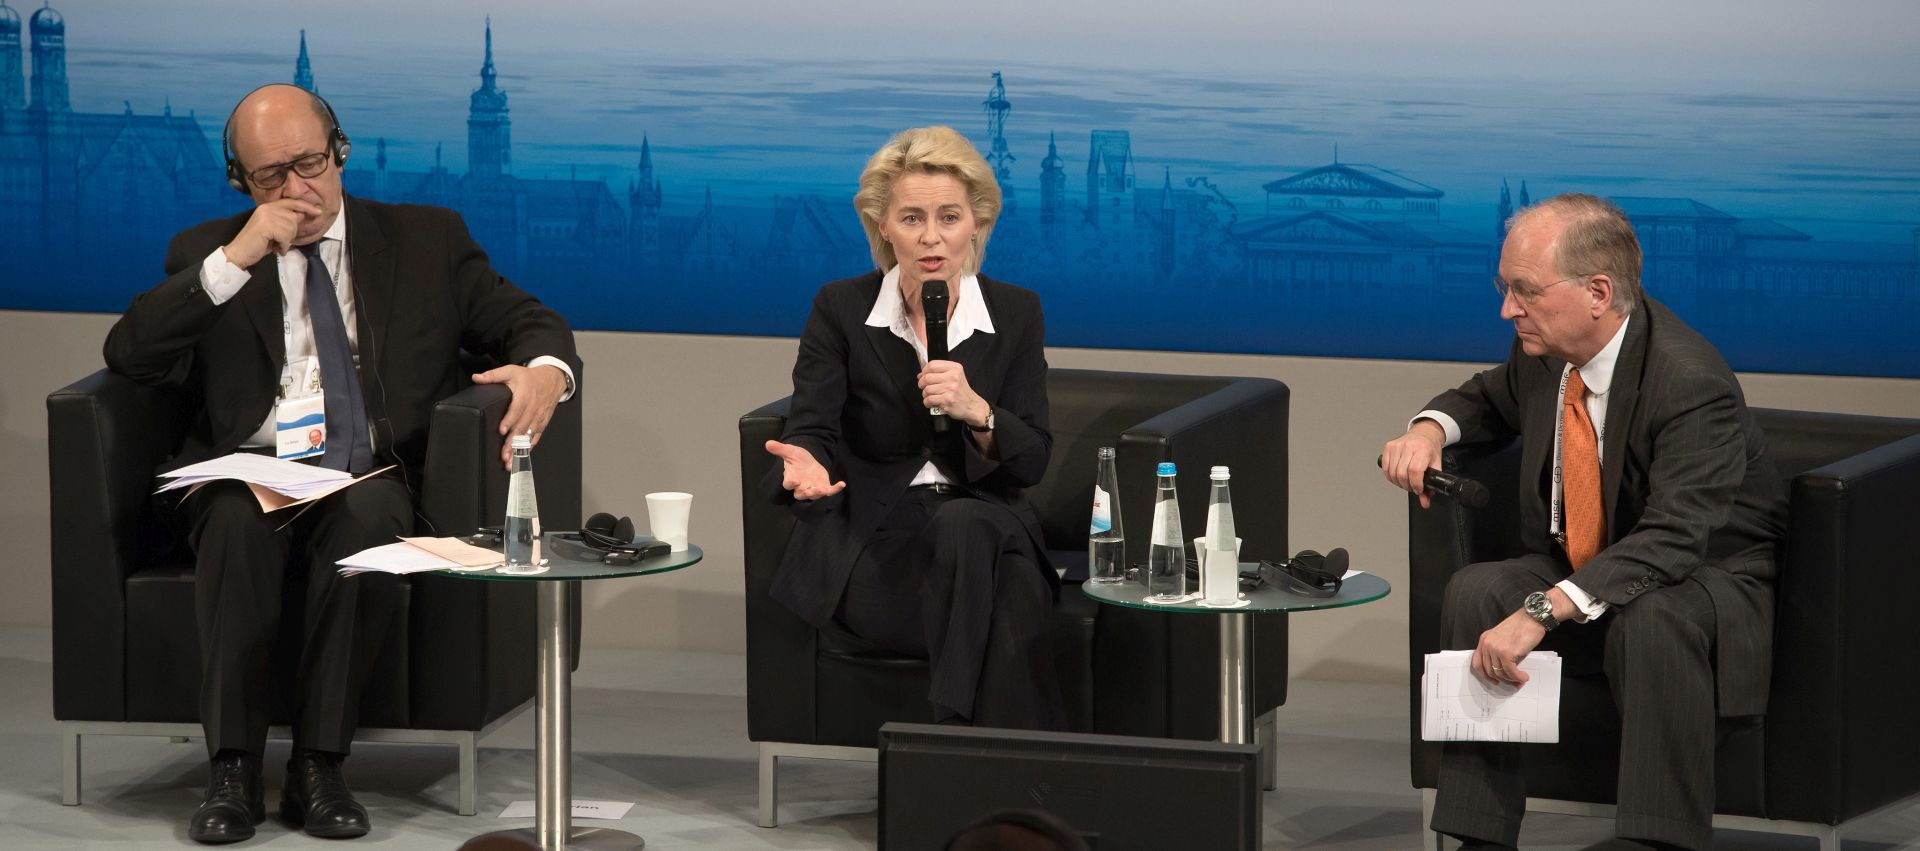 KONFERENCIJA O SIGURNOSTI: Borba protiv IS-a i migrantska kriza ključne teme